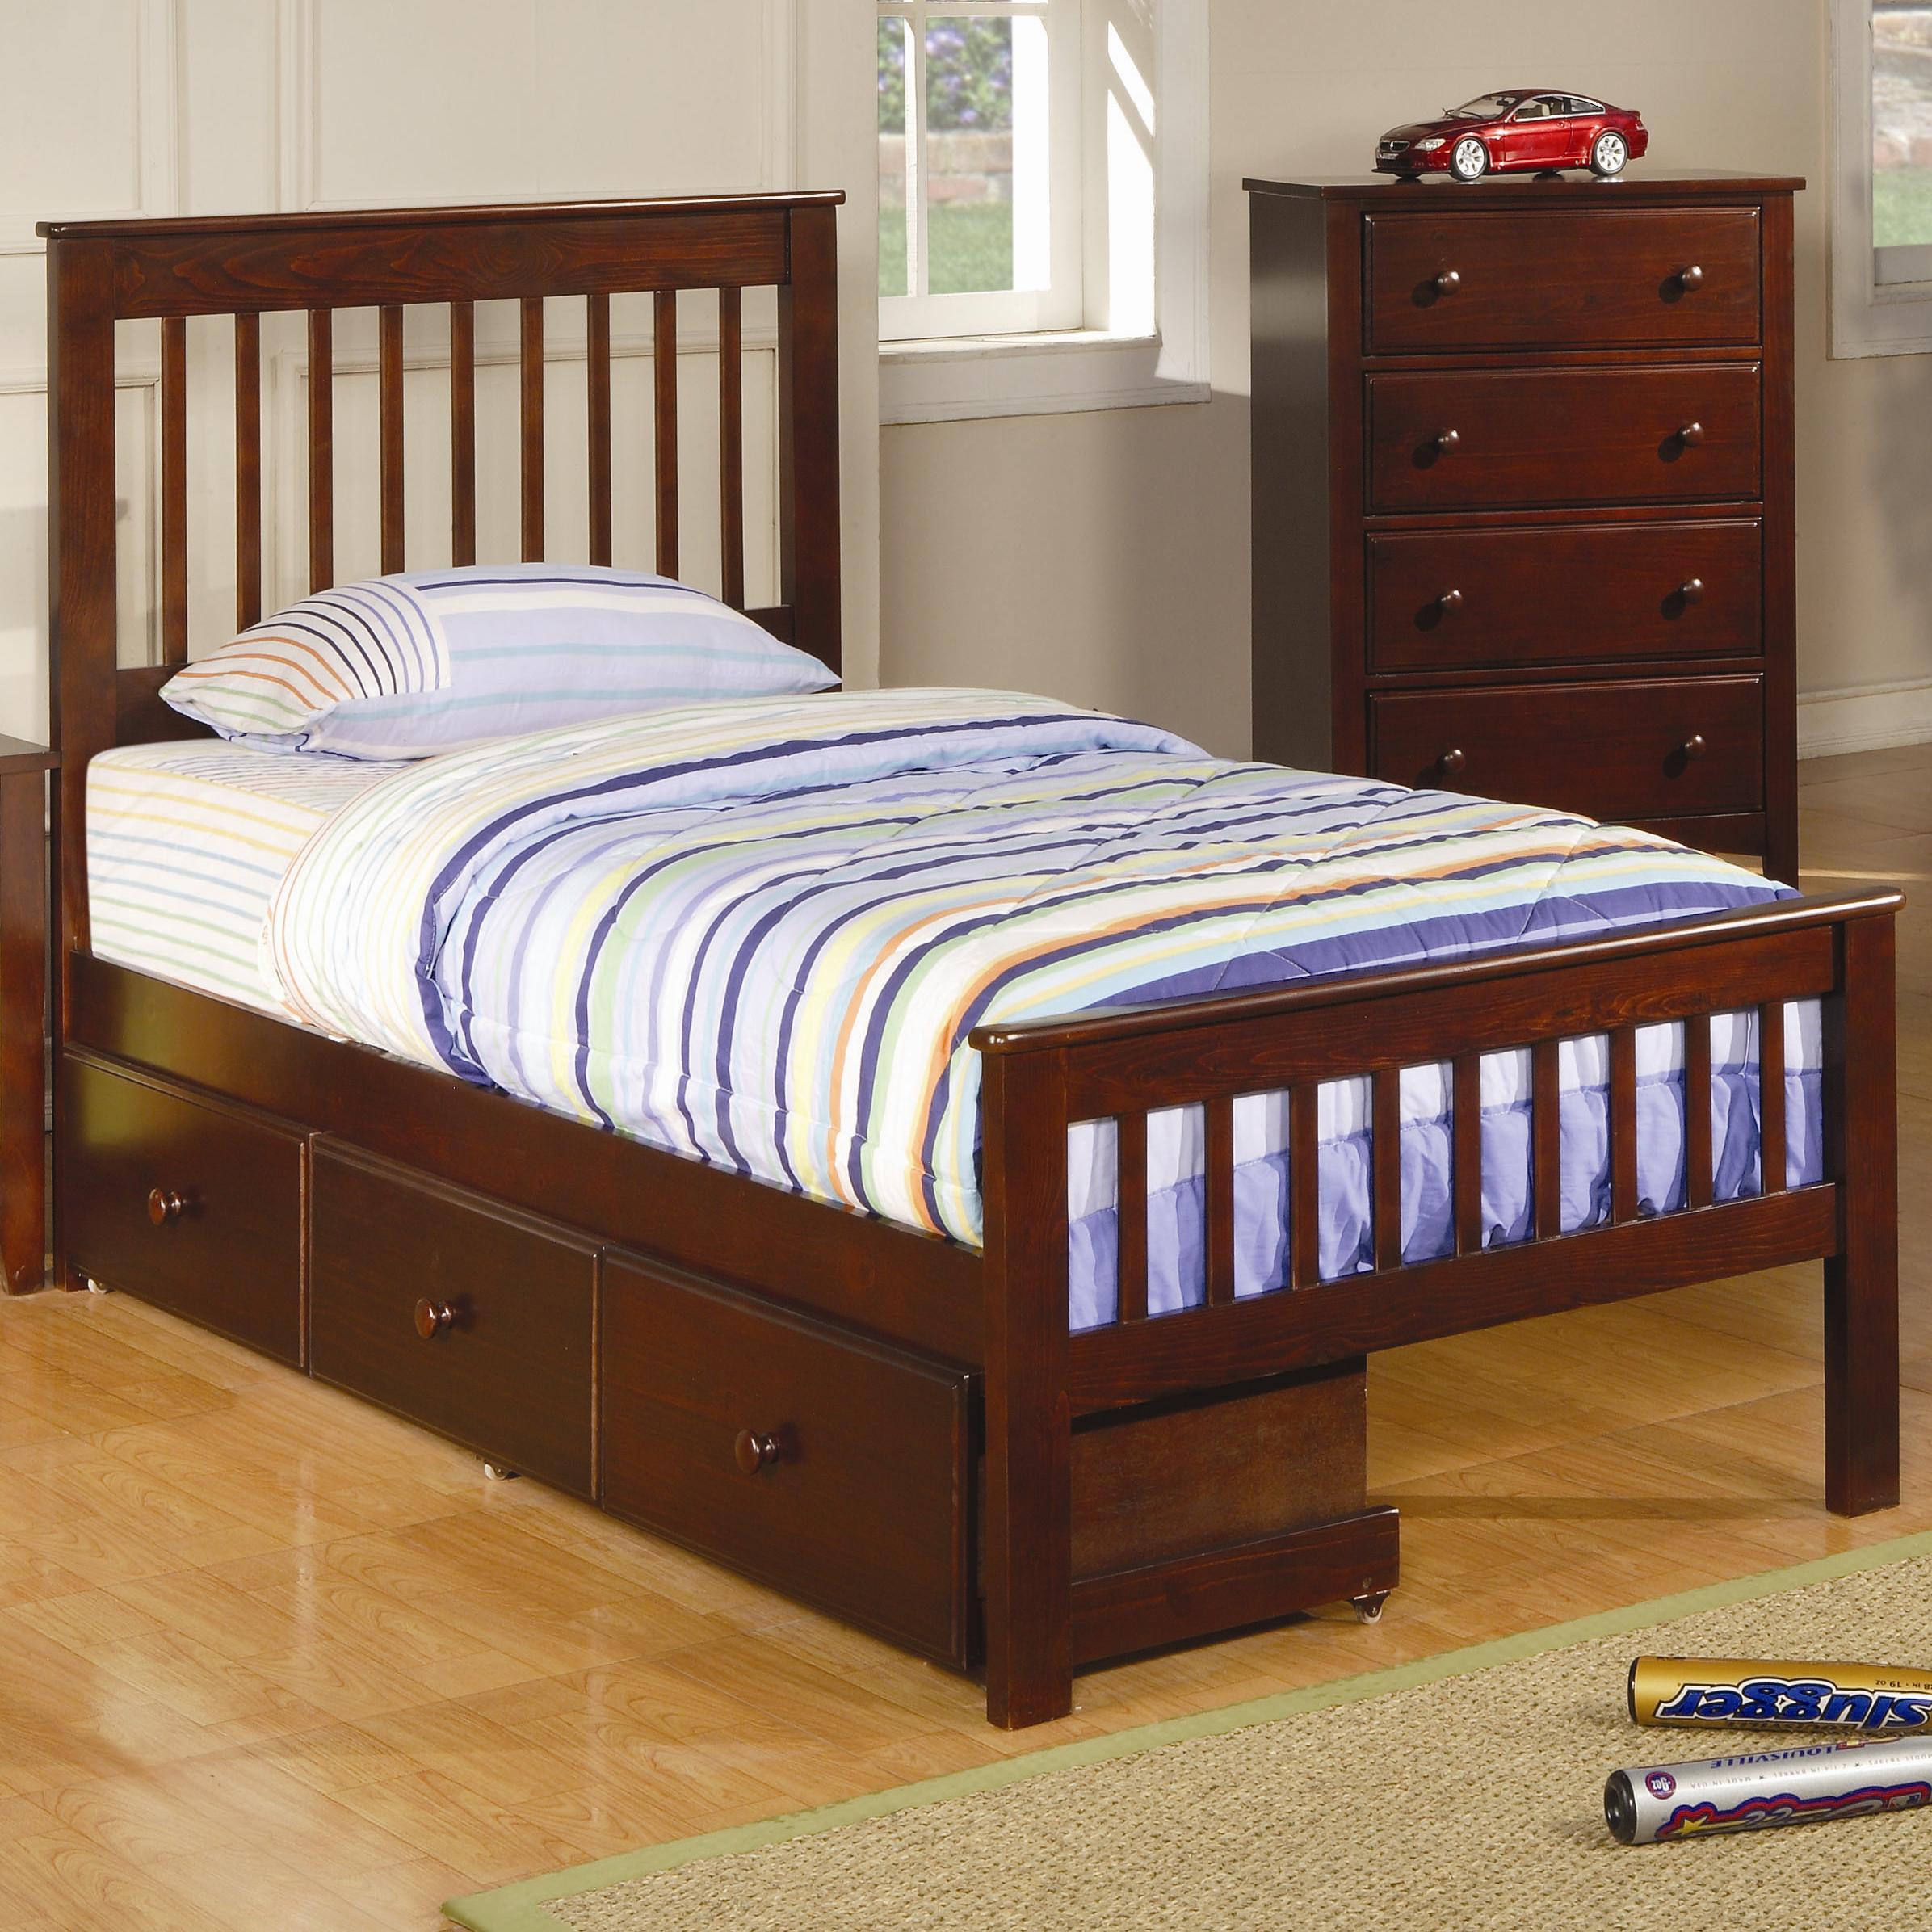 coaster parker twin slat bed with underbed storage drawer unit dunk bright furniture panel. Black Bedroom Furniture Sets. Home Design Ideas